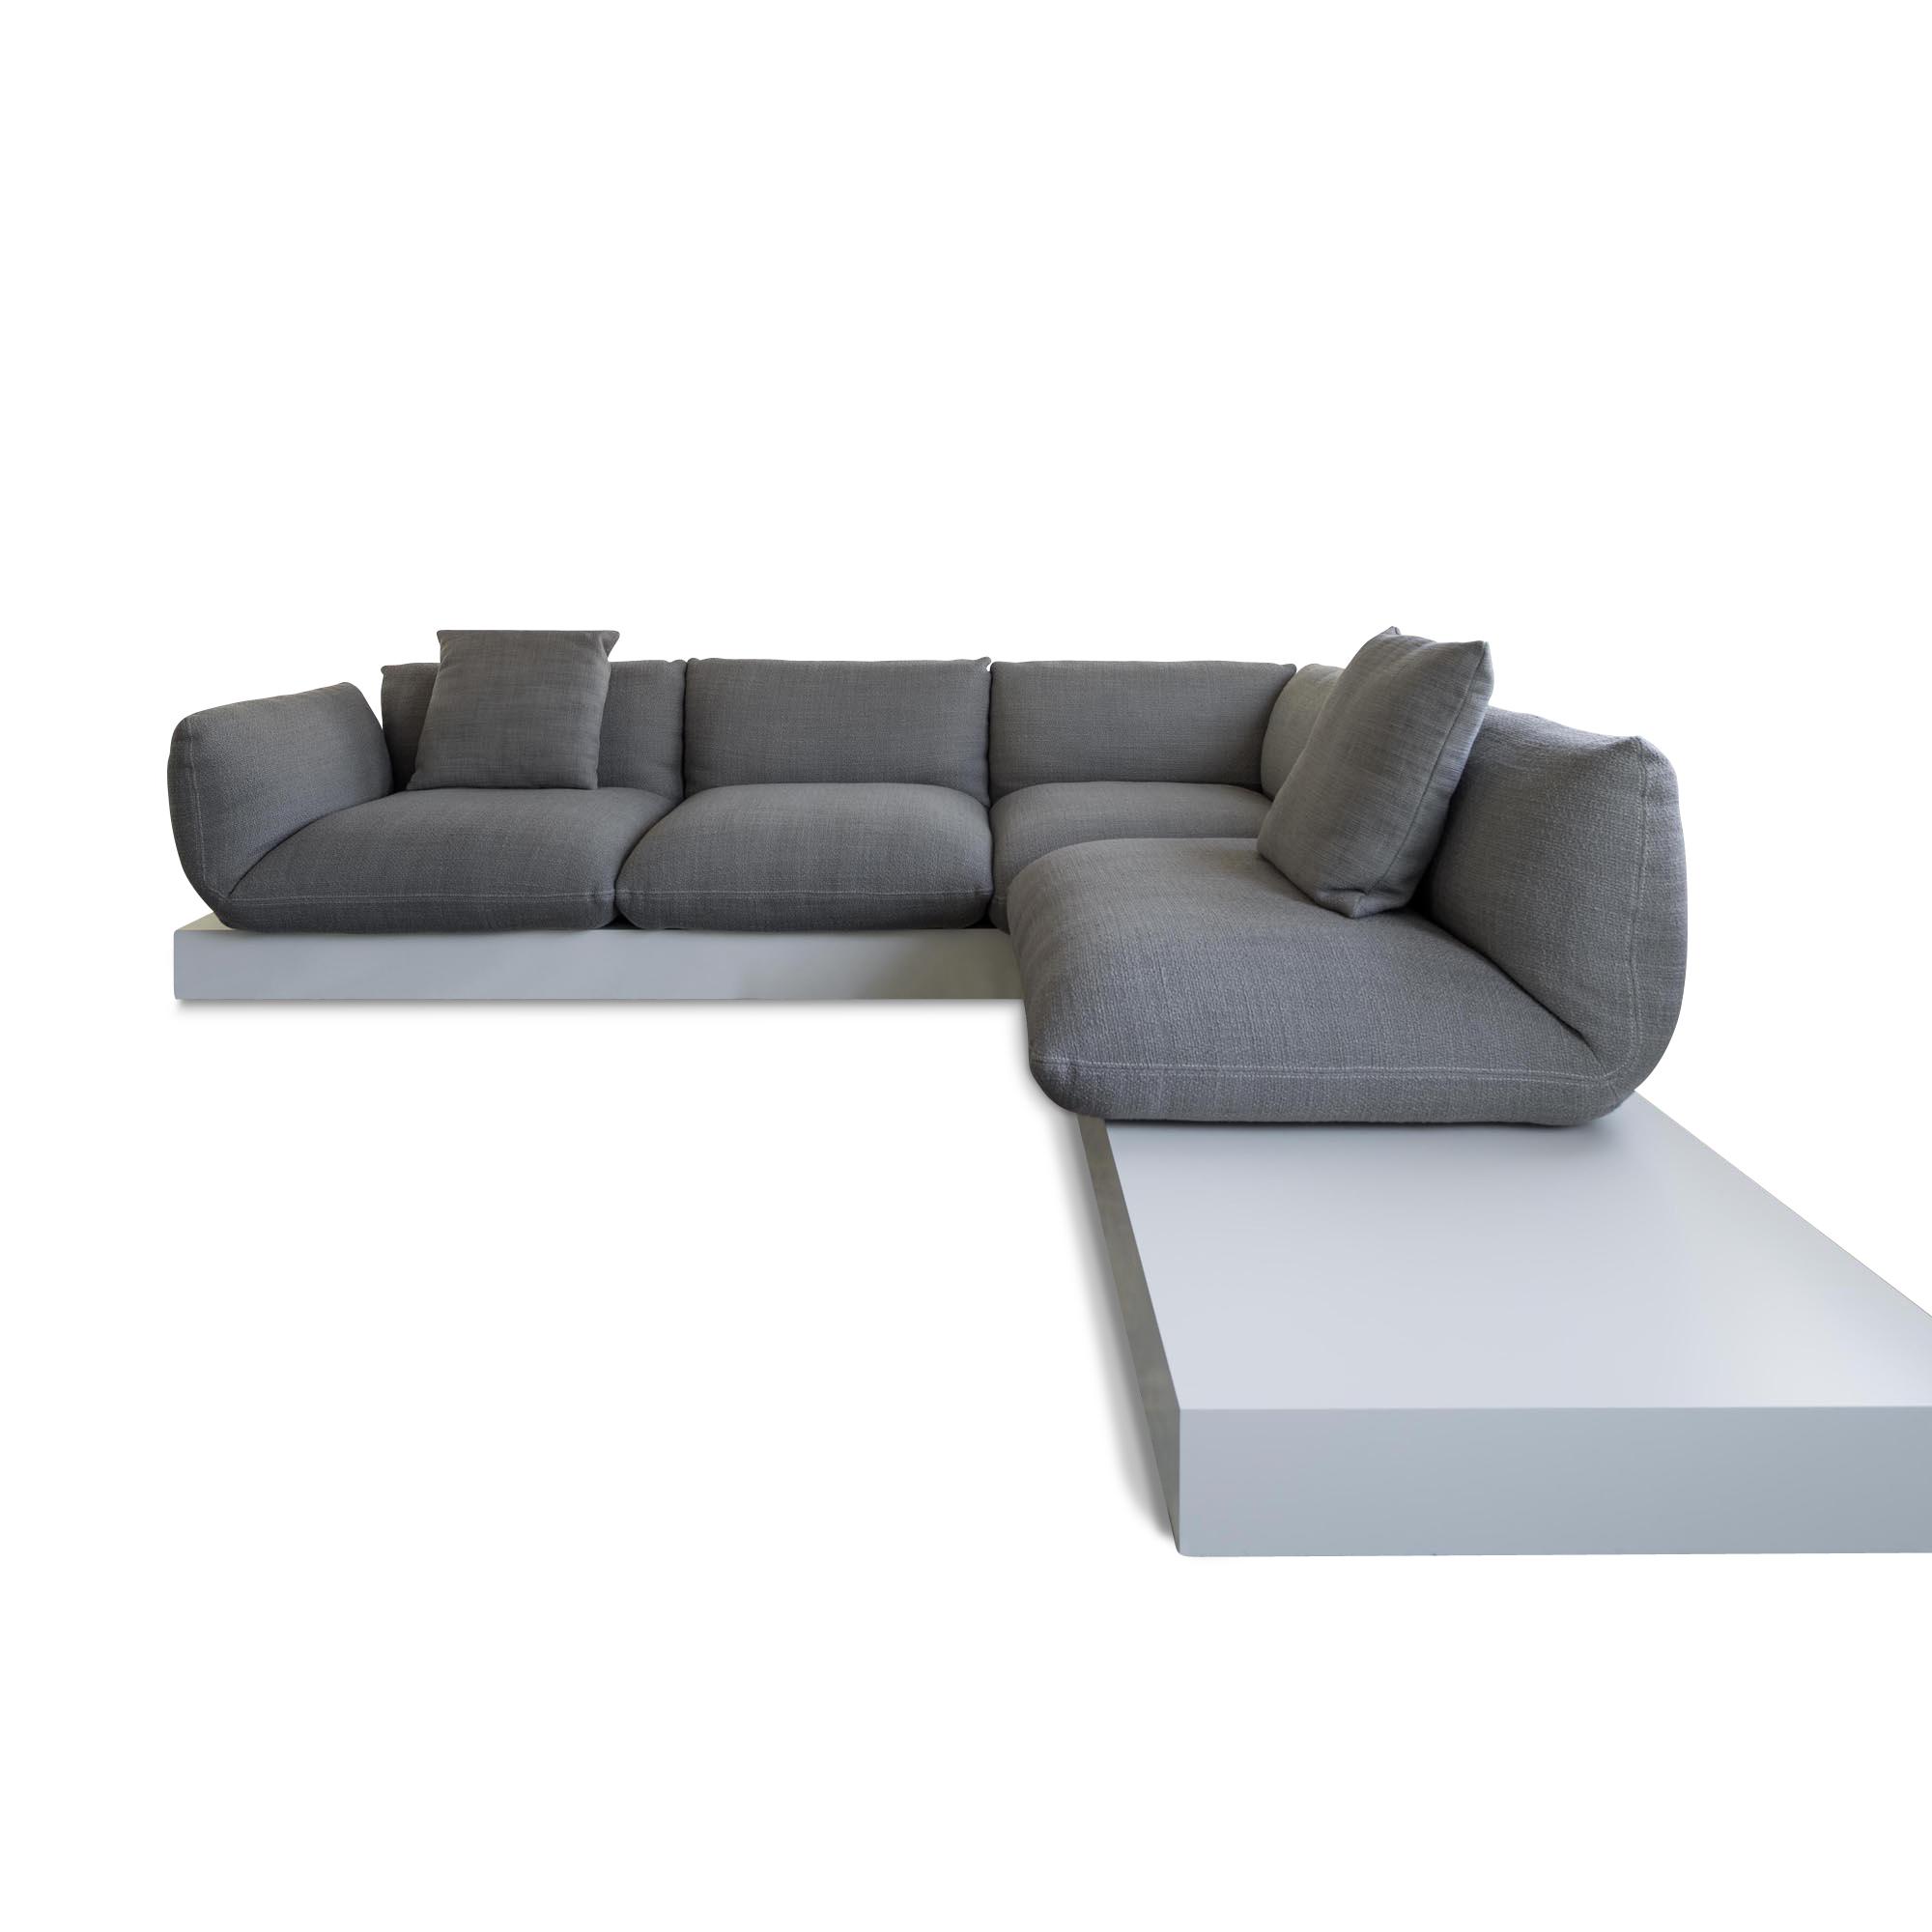 Top Ergebnis 50 Neu 2 Sitzer sofa Mit Relaxfunktion Bild 2017 Kse4